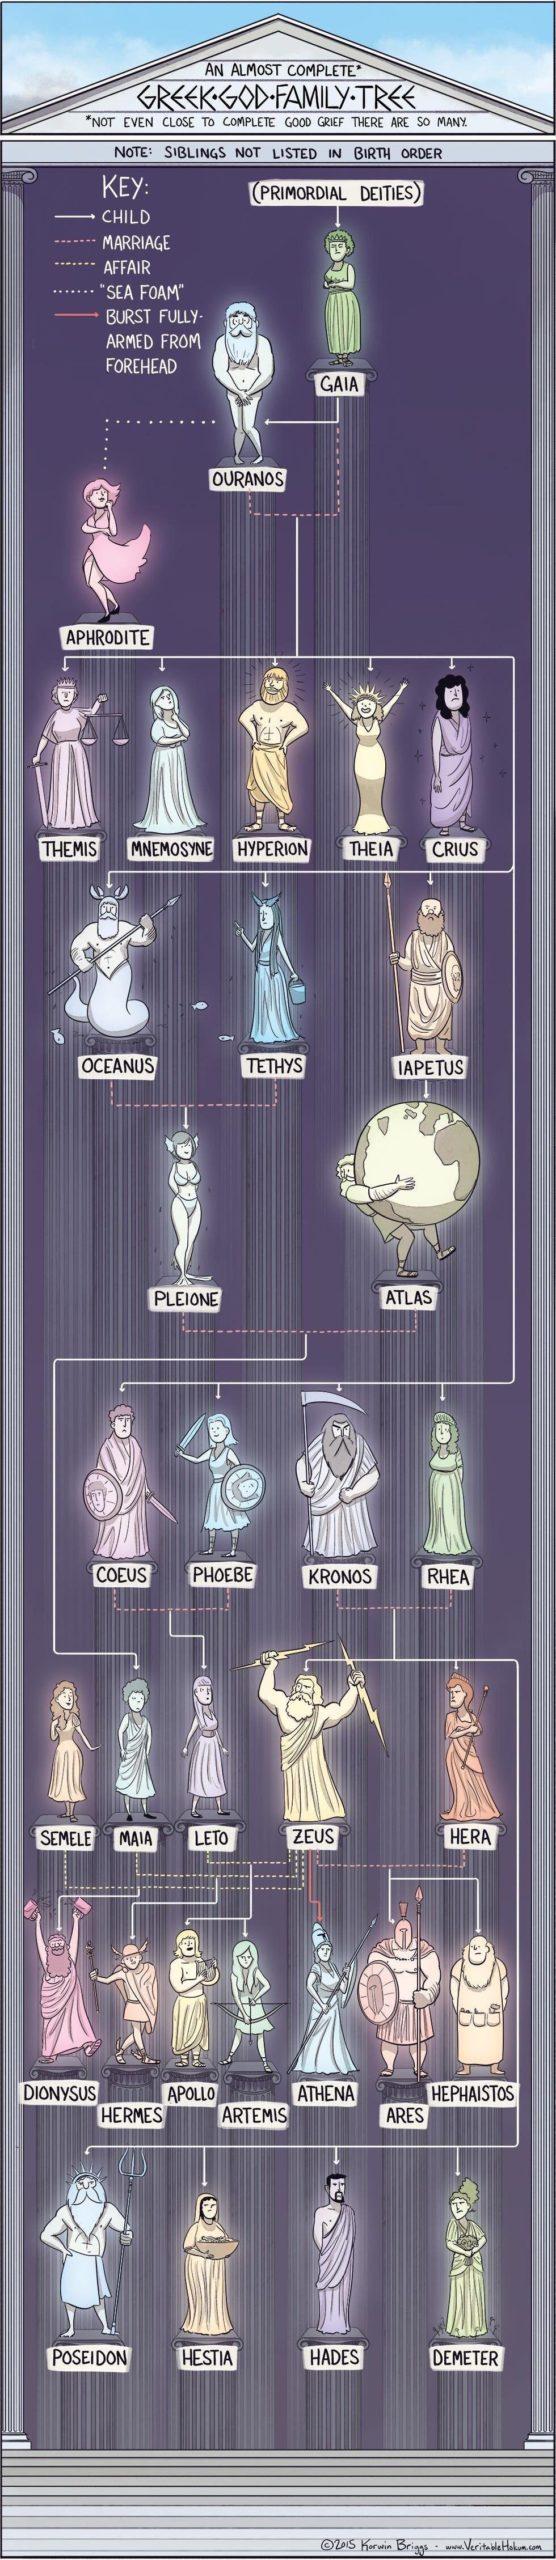 greek god family tree, infographics, cool infographics, interesting inforgraphics, cool guides cool charts, interesting guides, interesting guide, cool guide random guides, random cool guides, random interesting guides, cool charts, interesting charts, random charts, informative charts, cool chart, interesting chart, random chart